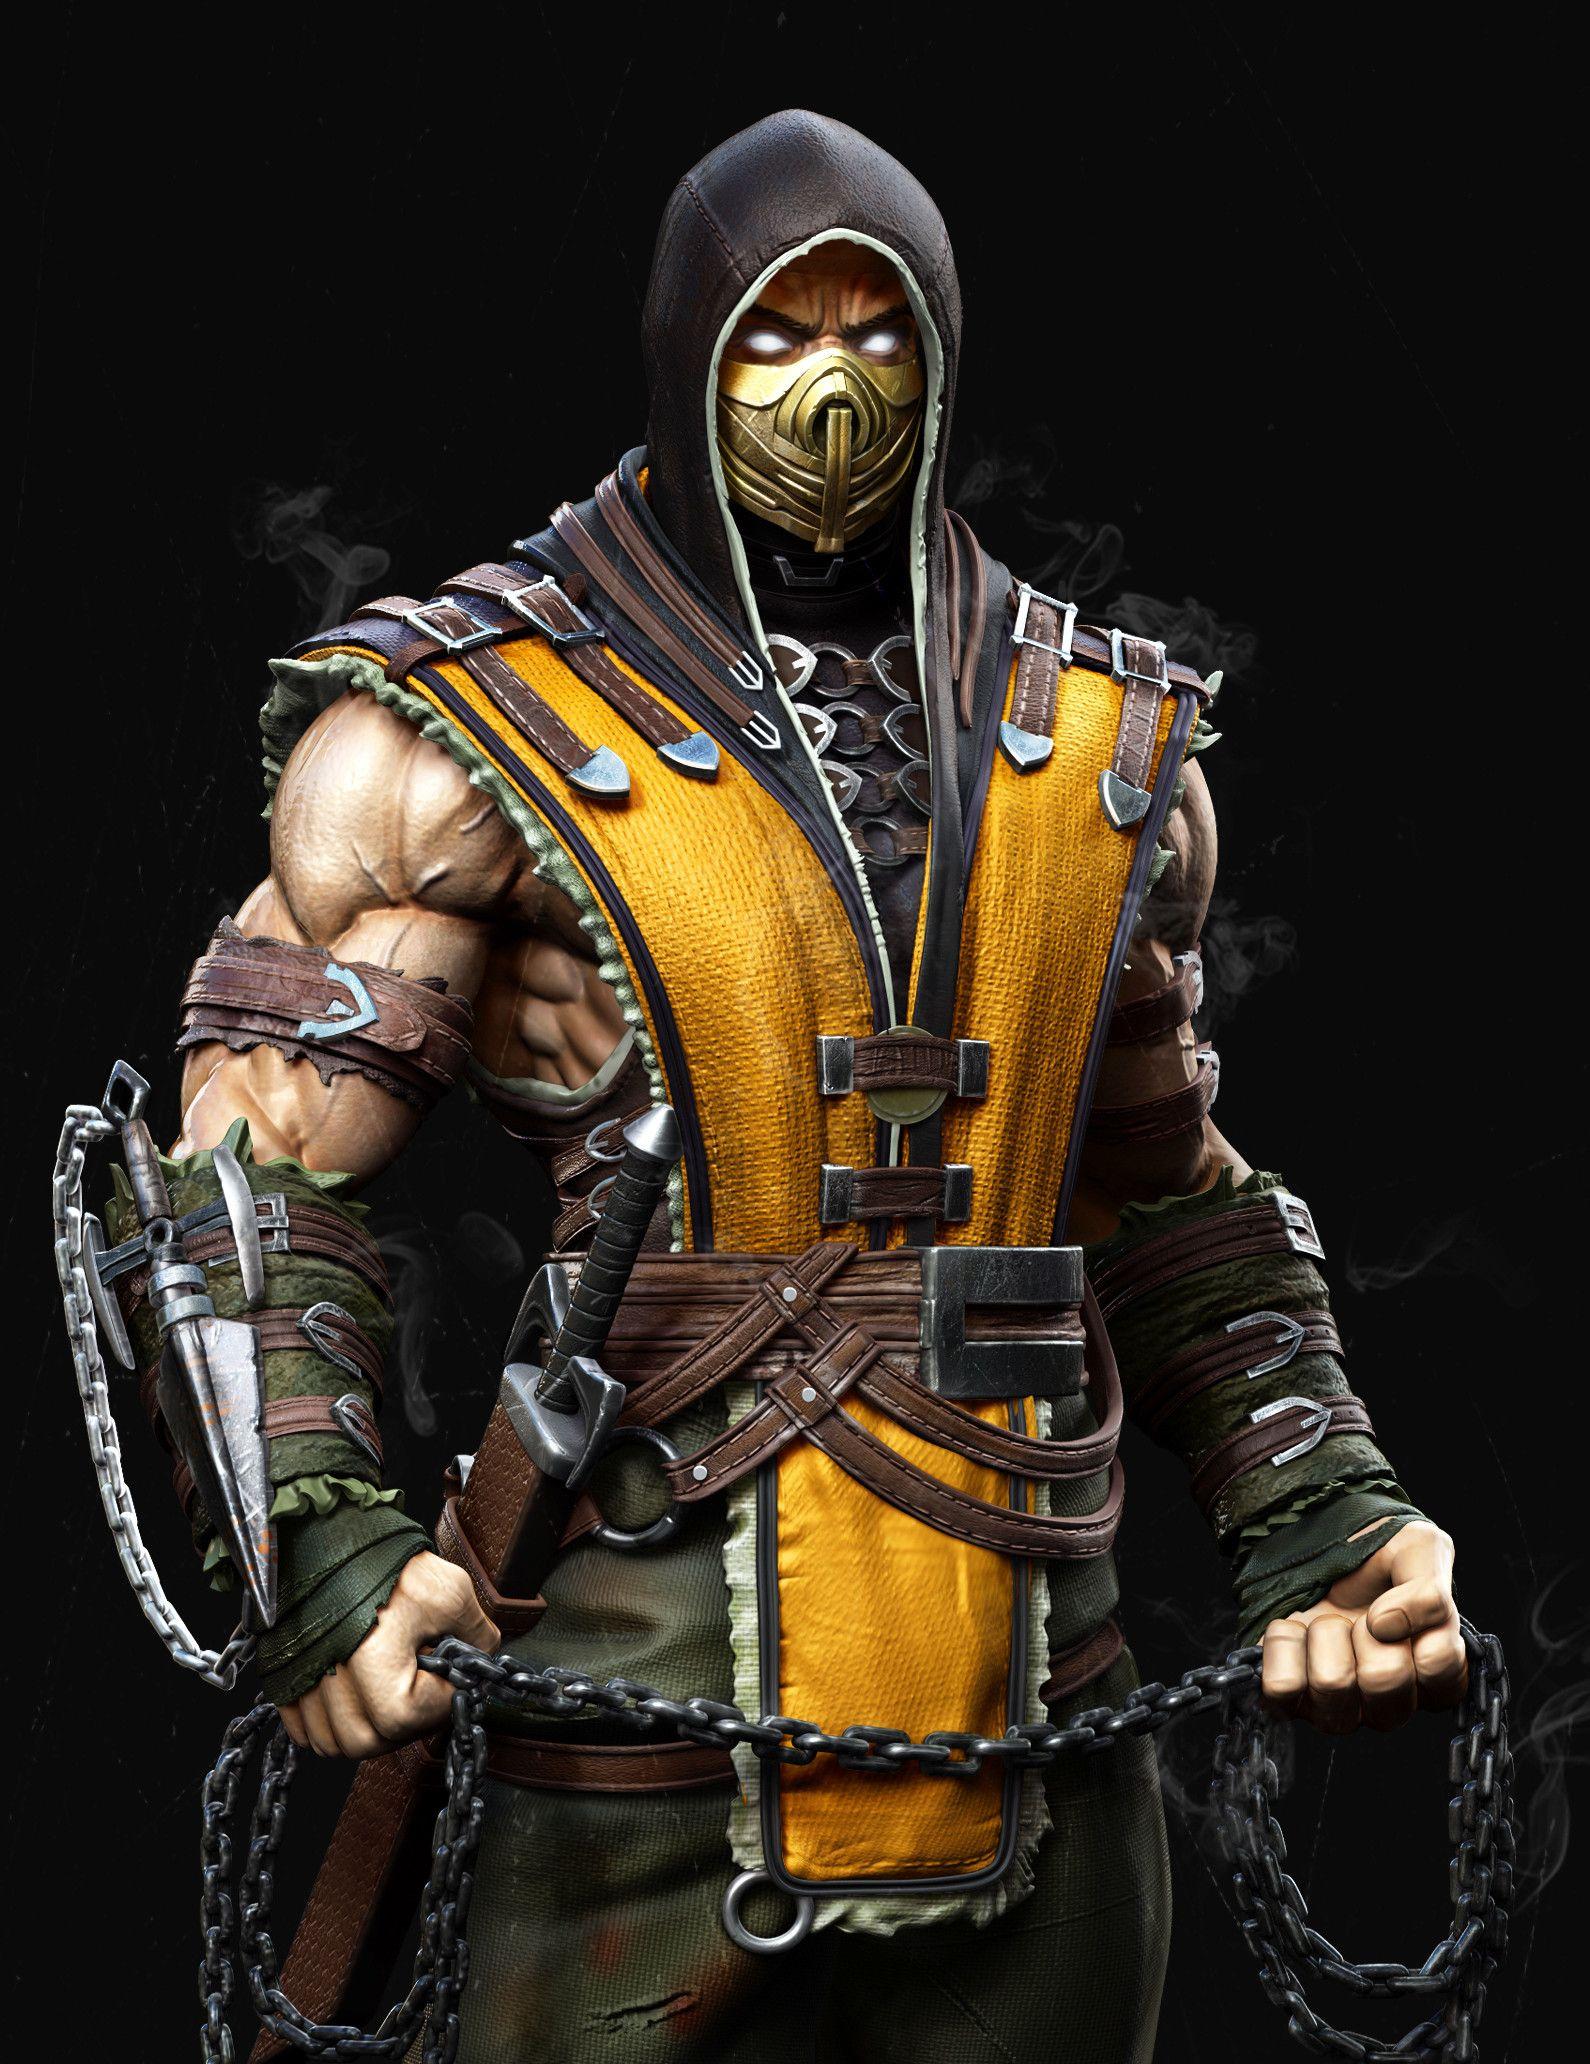 Mortal Kombat Scorpion By Anil Gurung Scorpion Mortal Kombat